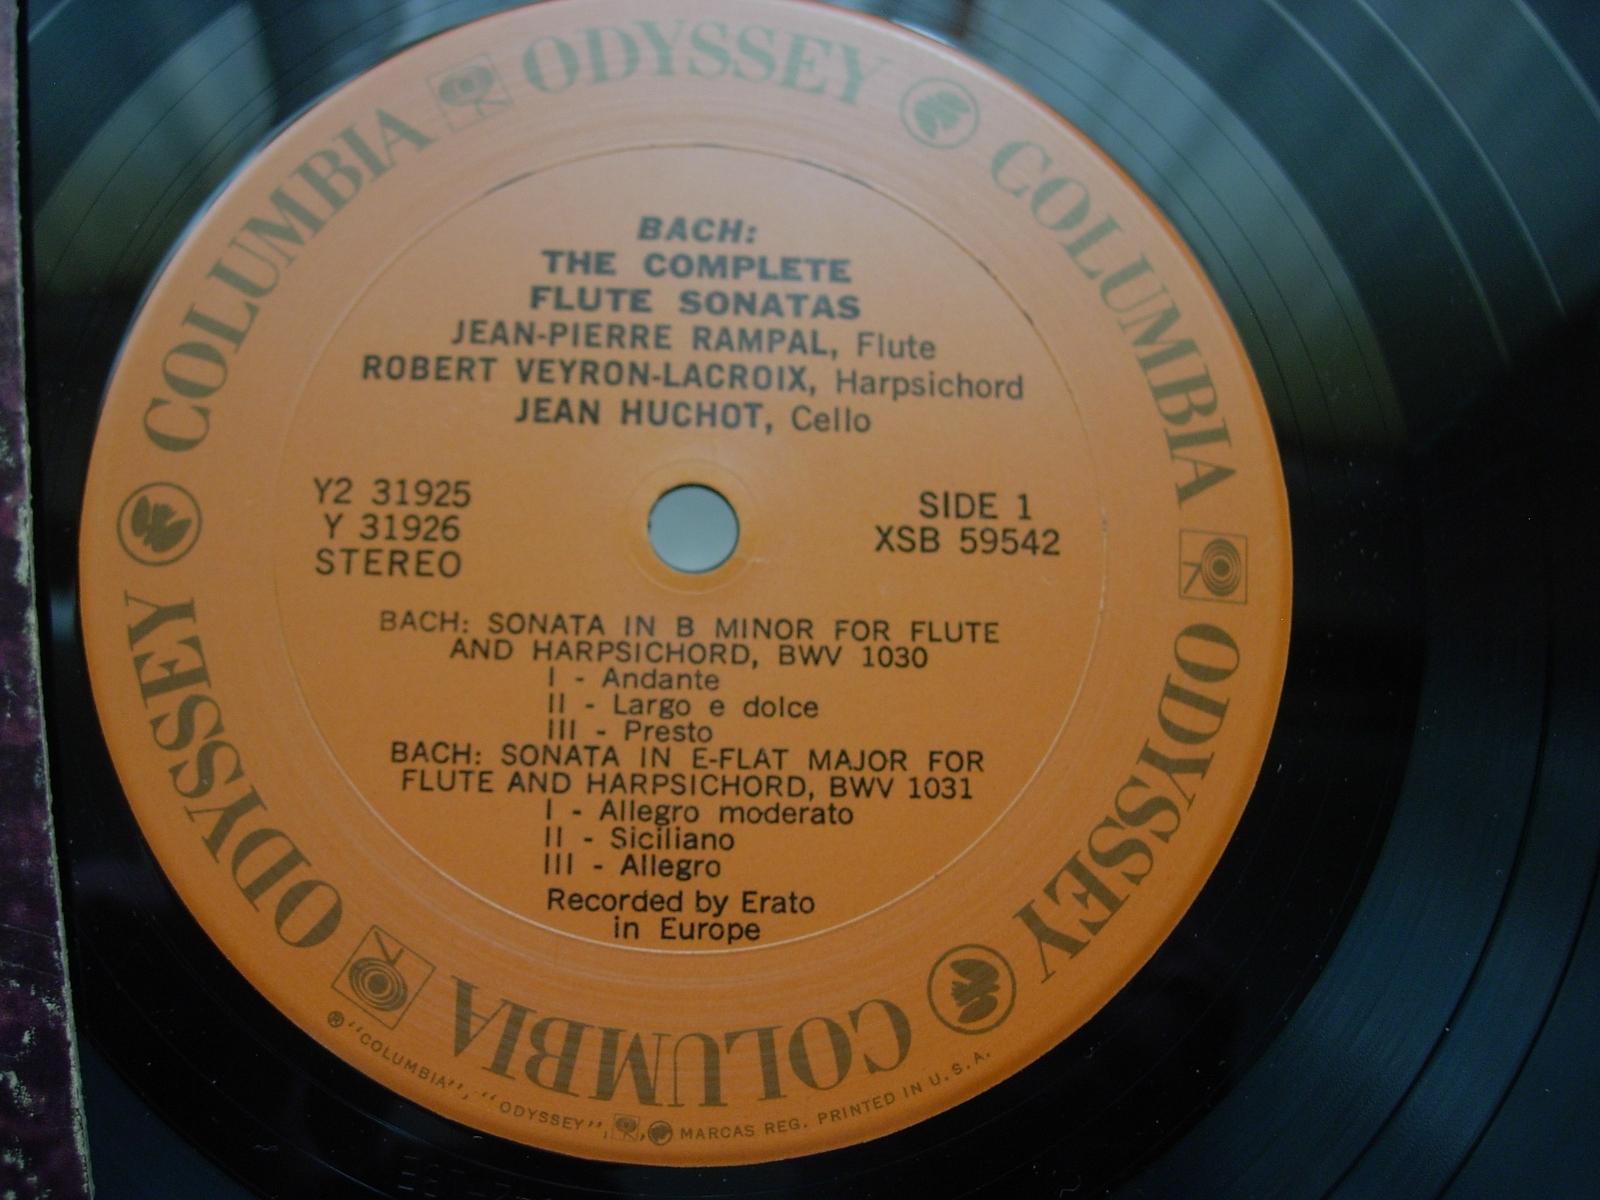 Jean-Pierre Rampal & Robert Veyron-Lacroix - Columbia Records XSB 59542